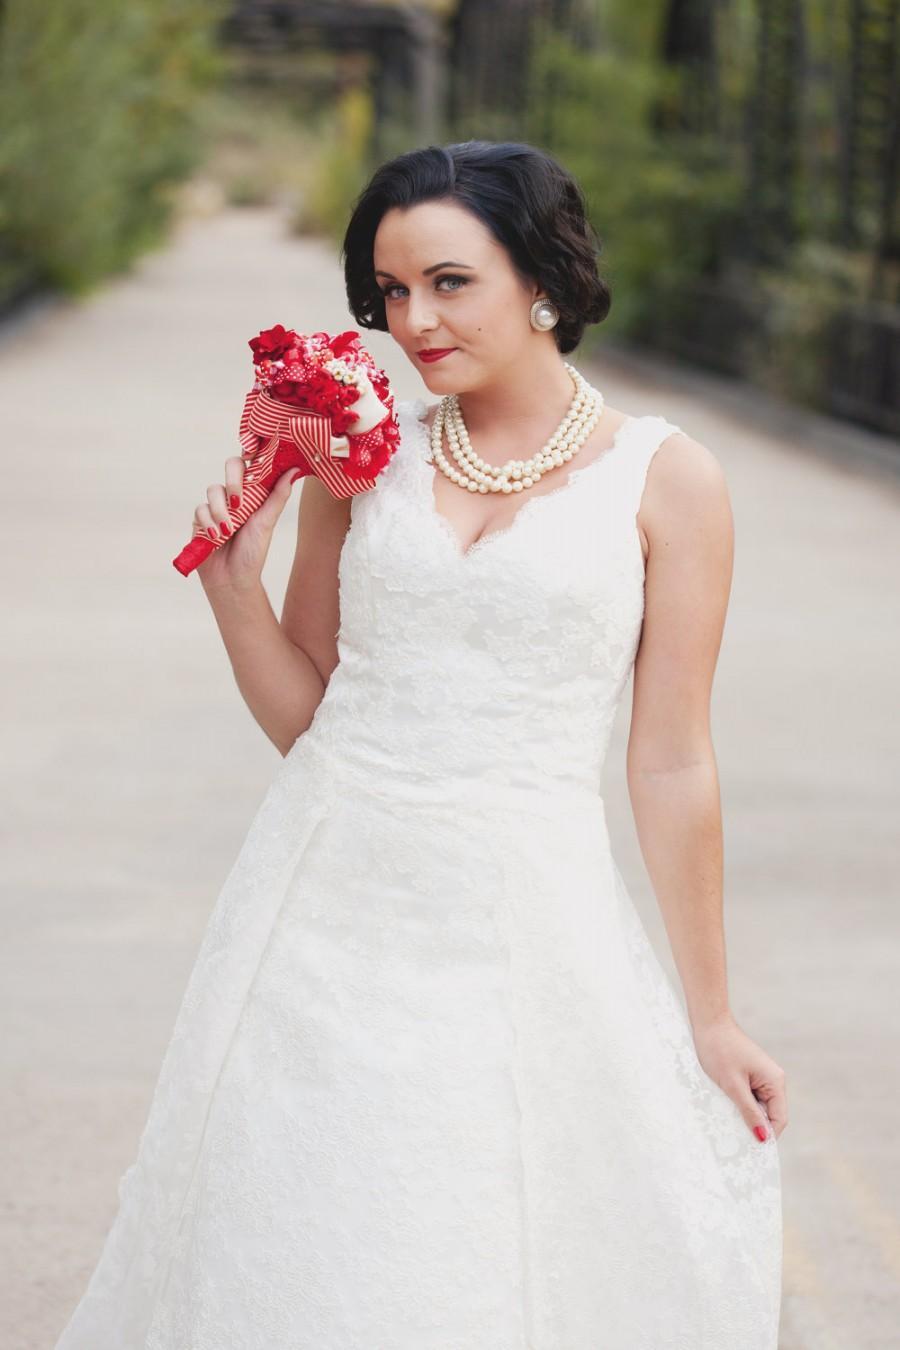 Wedding - Lace Wedding Dress - Tea Length - Runaround Sue